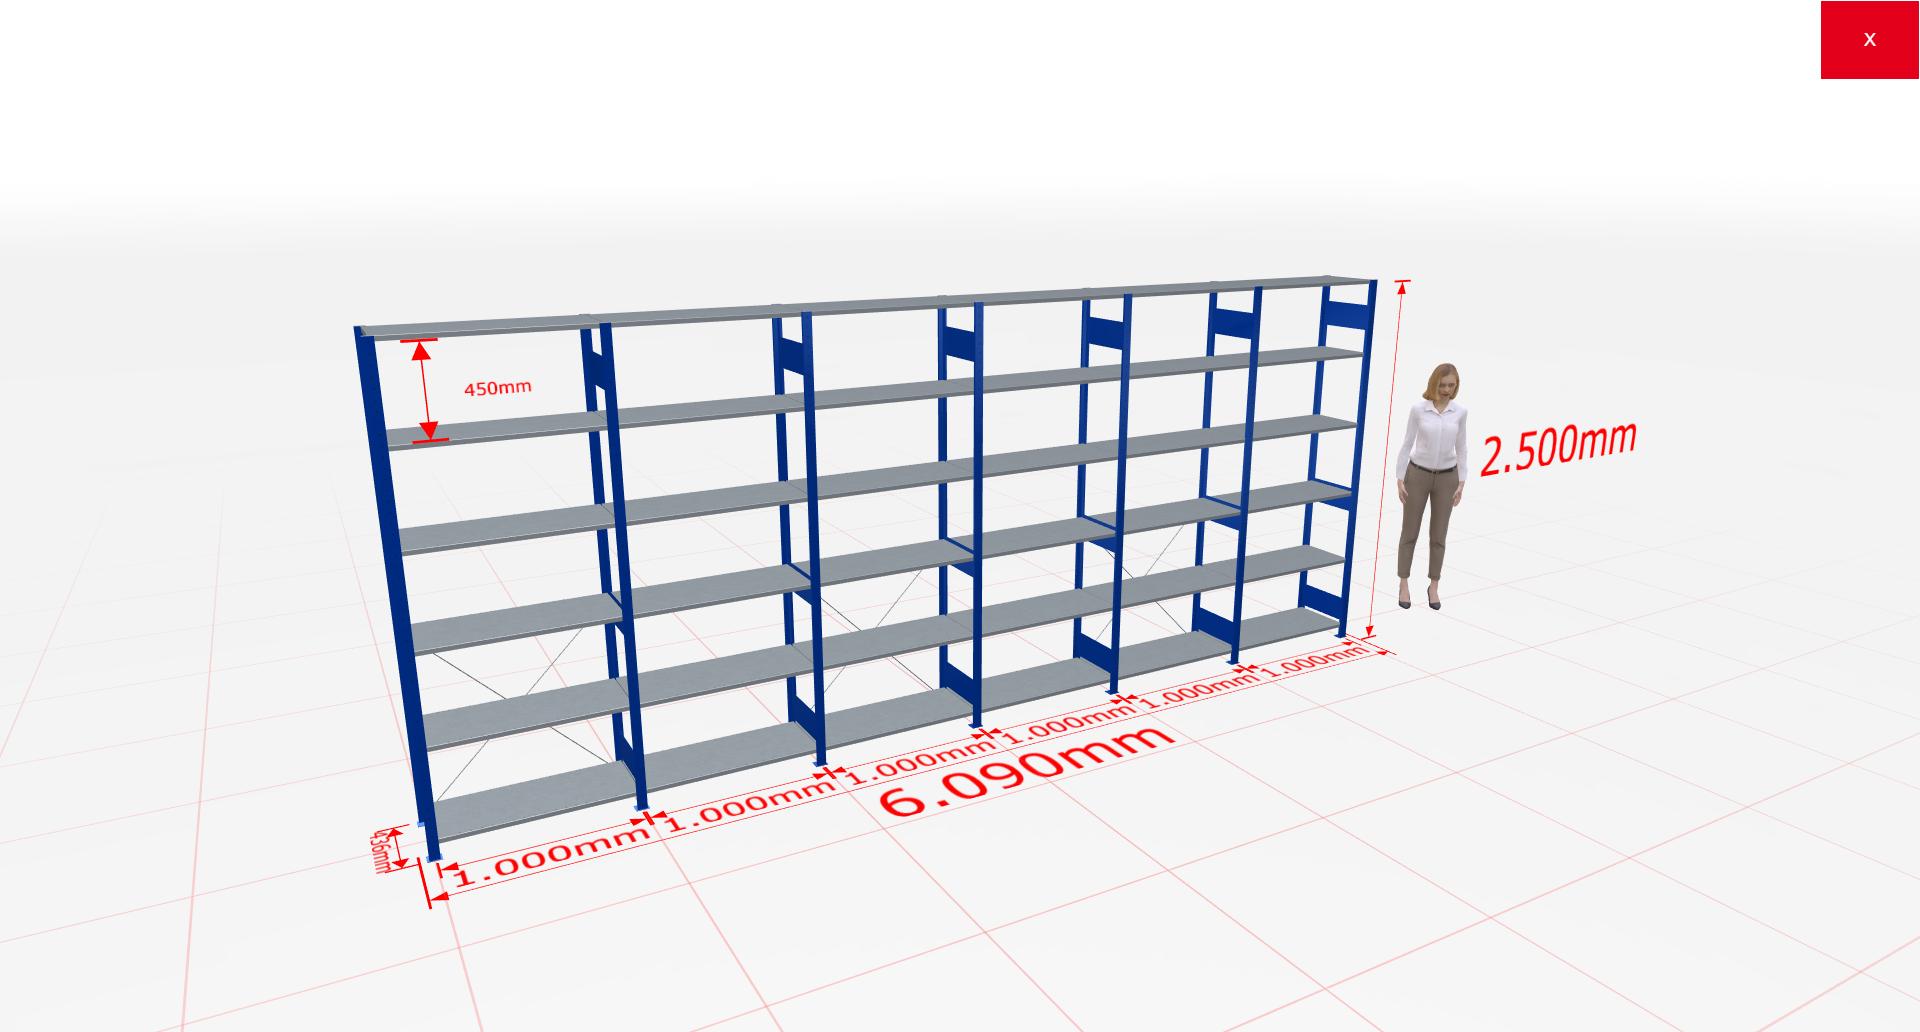 Fachbodenregal Komplettregal 2500x6090x400 mm (HxBxT) SCHULTE Lagertechnik blau 6 Ebenen  150 kg je Boden